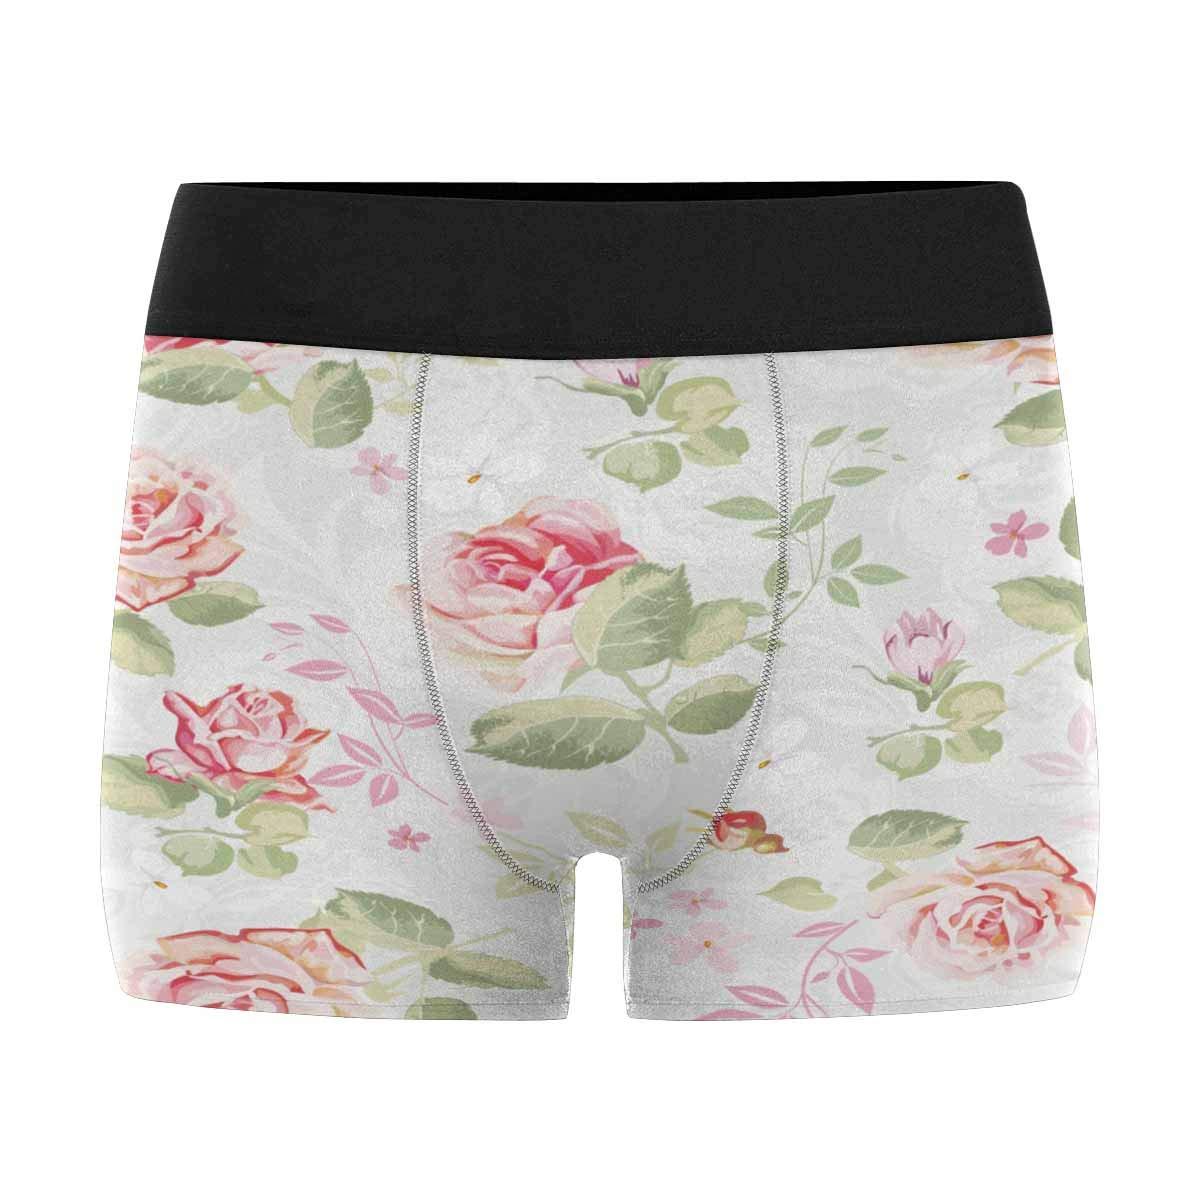 XS-3XL INTERESTPRINT Mens Boxer Briefs Underwear Abstract Elegance Seamless Floral